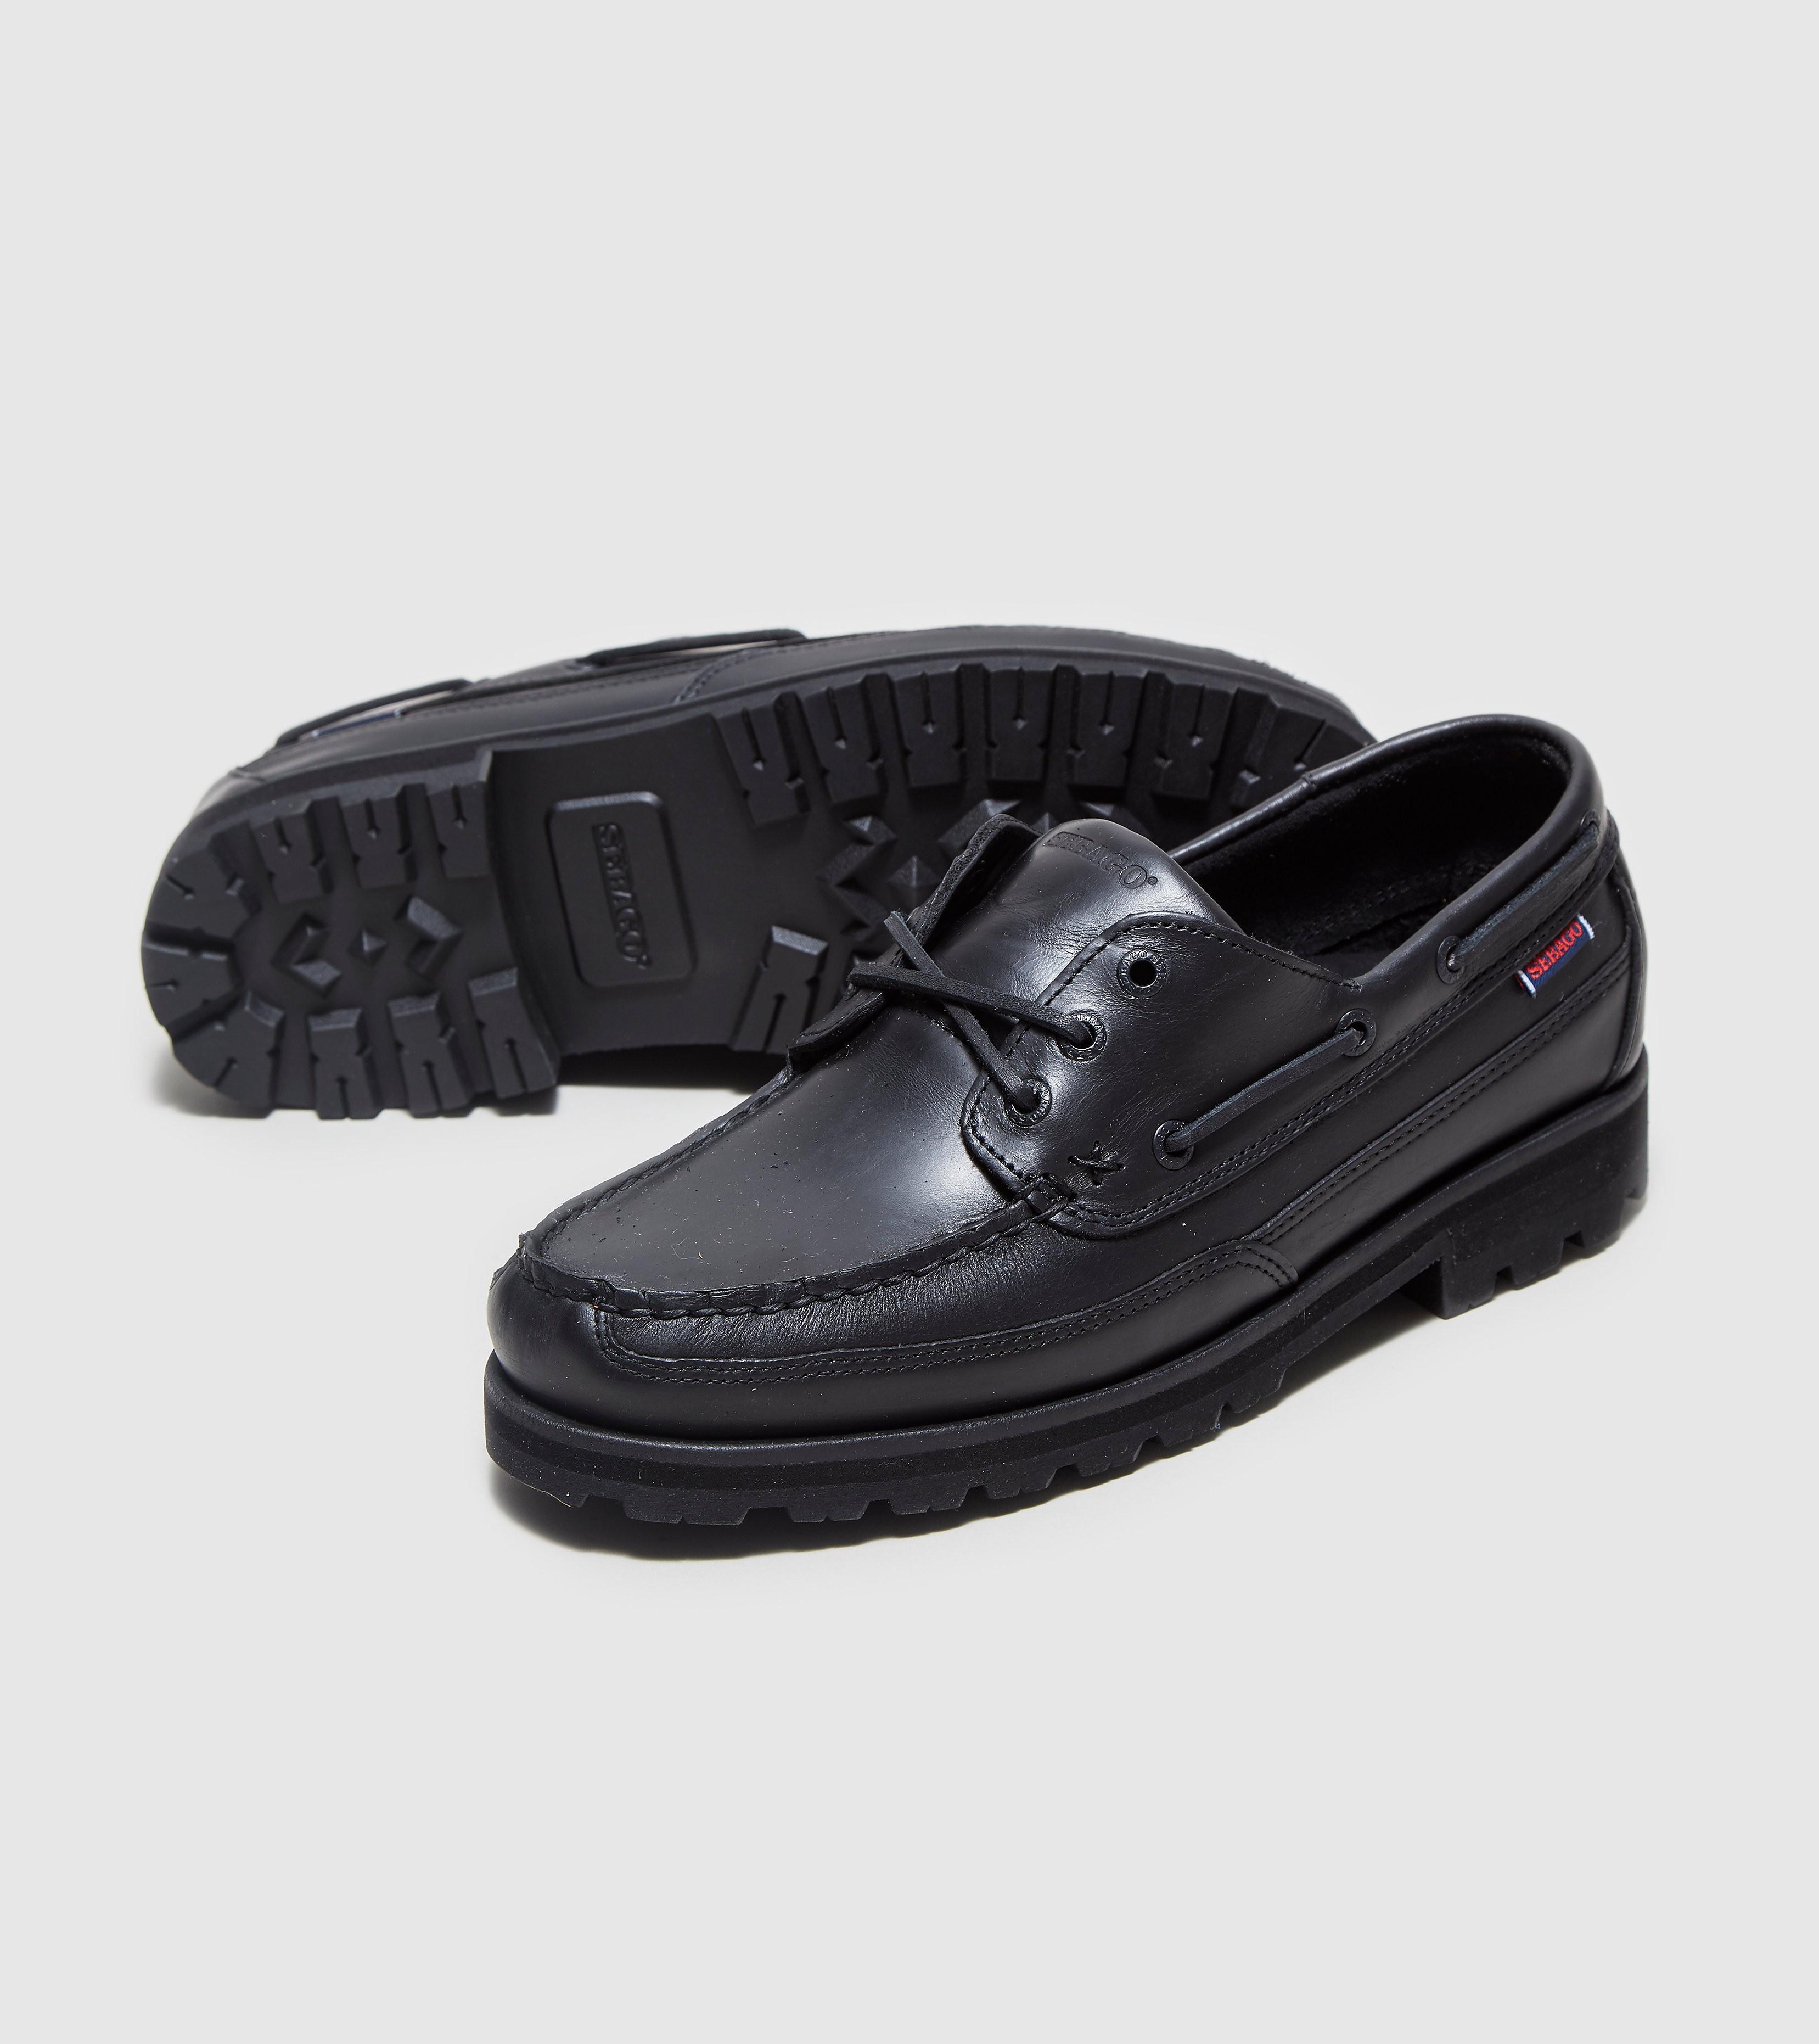 Sebago Vershire 3-Eye Boat Shoes